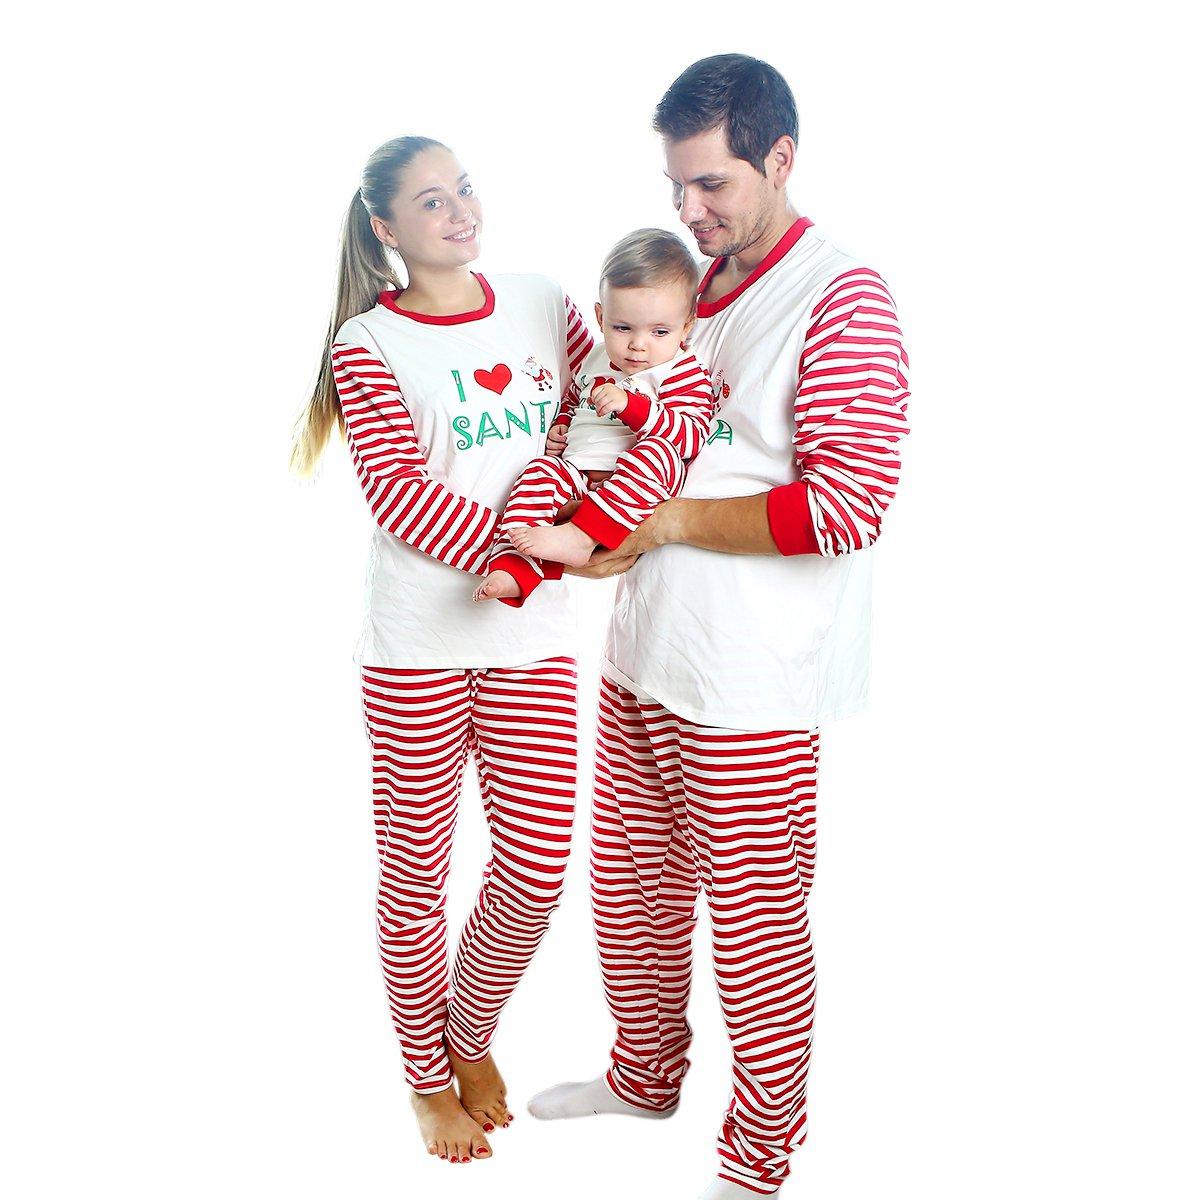 Matching Christmas Pajamas for Family with Baby,BOBORA Stripes Sleepwear